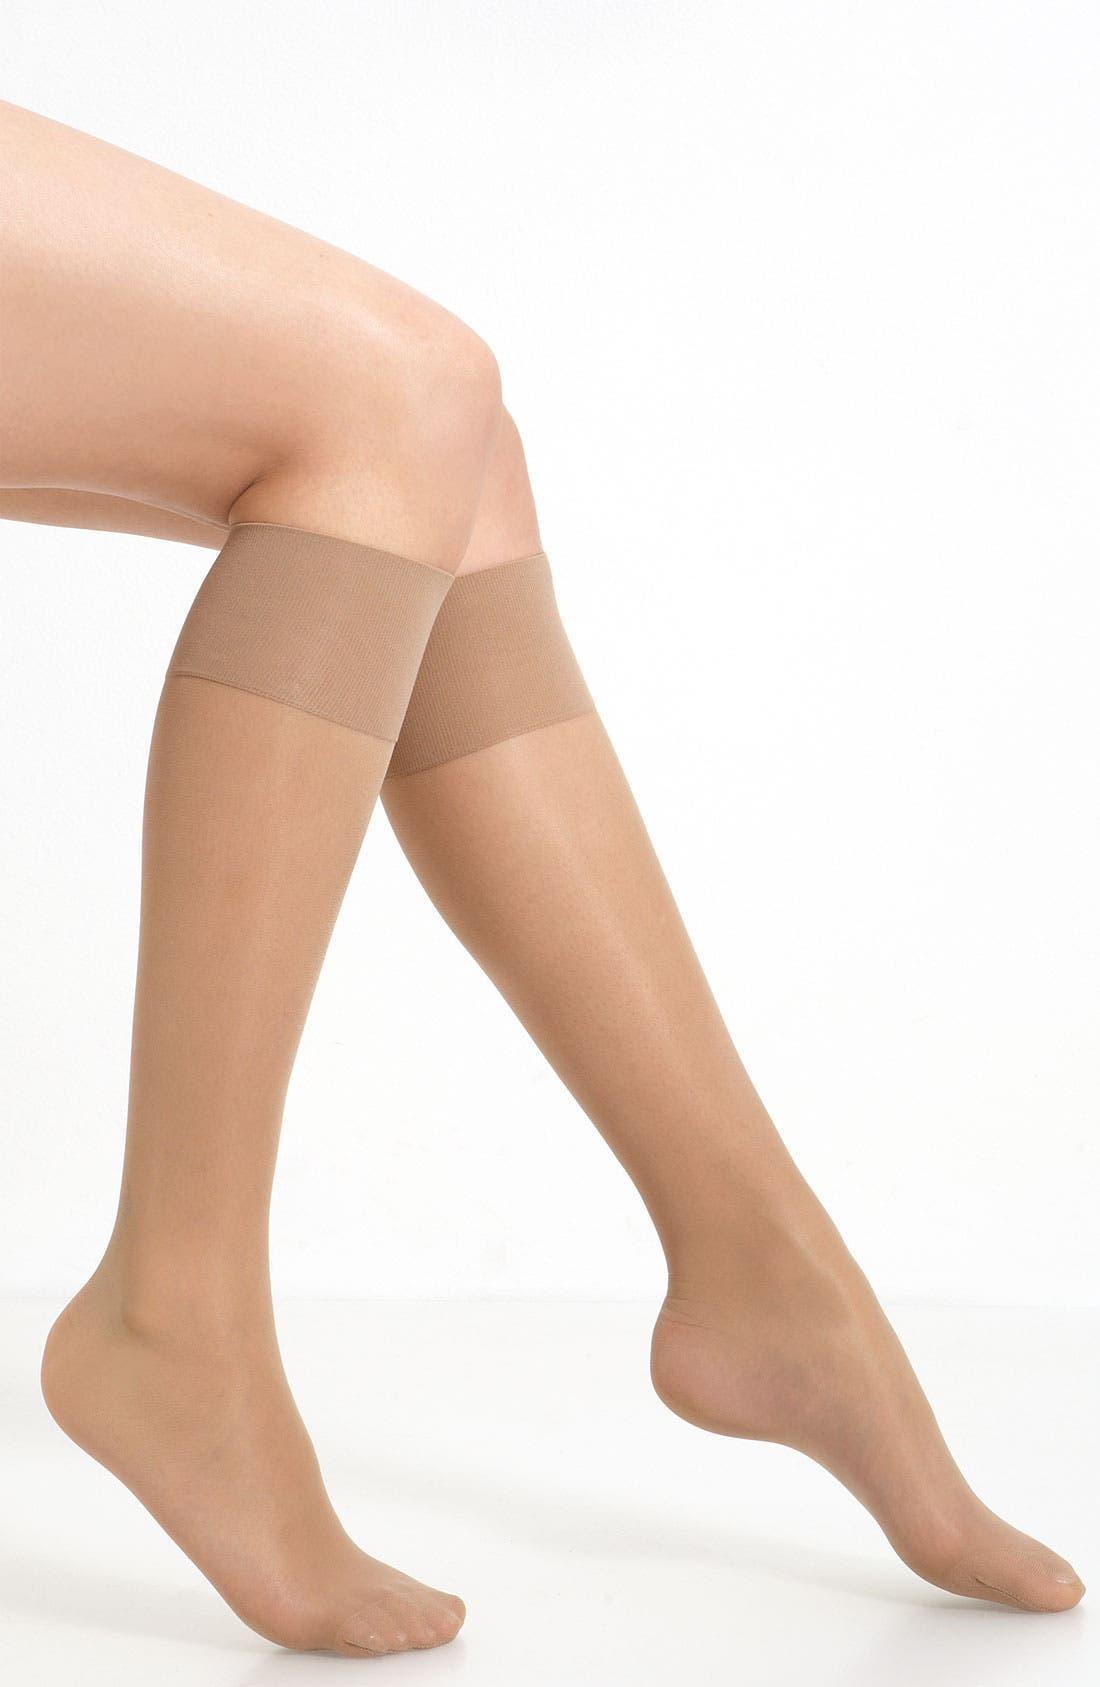 OROBLU, 'Mi-Bas Repos 70' Sheer Support Knee Highs, Main thumbnail 1, color, NUDE